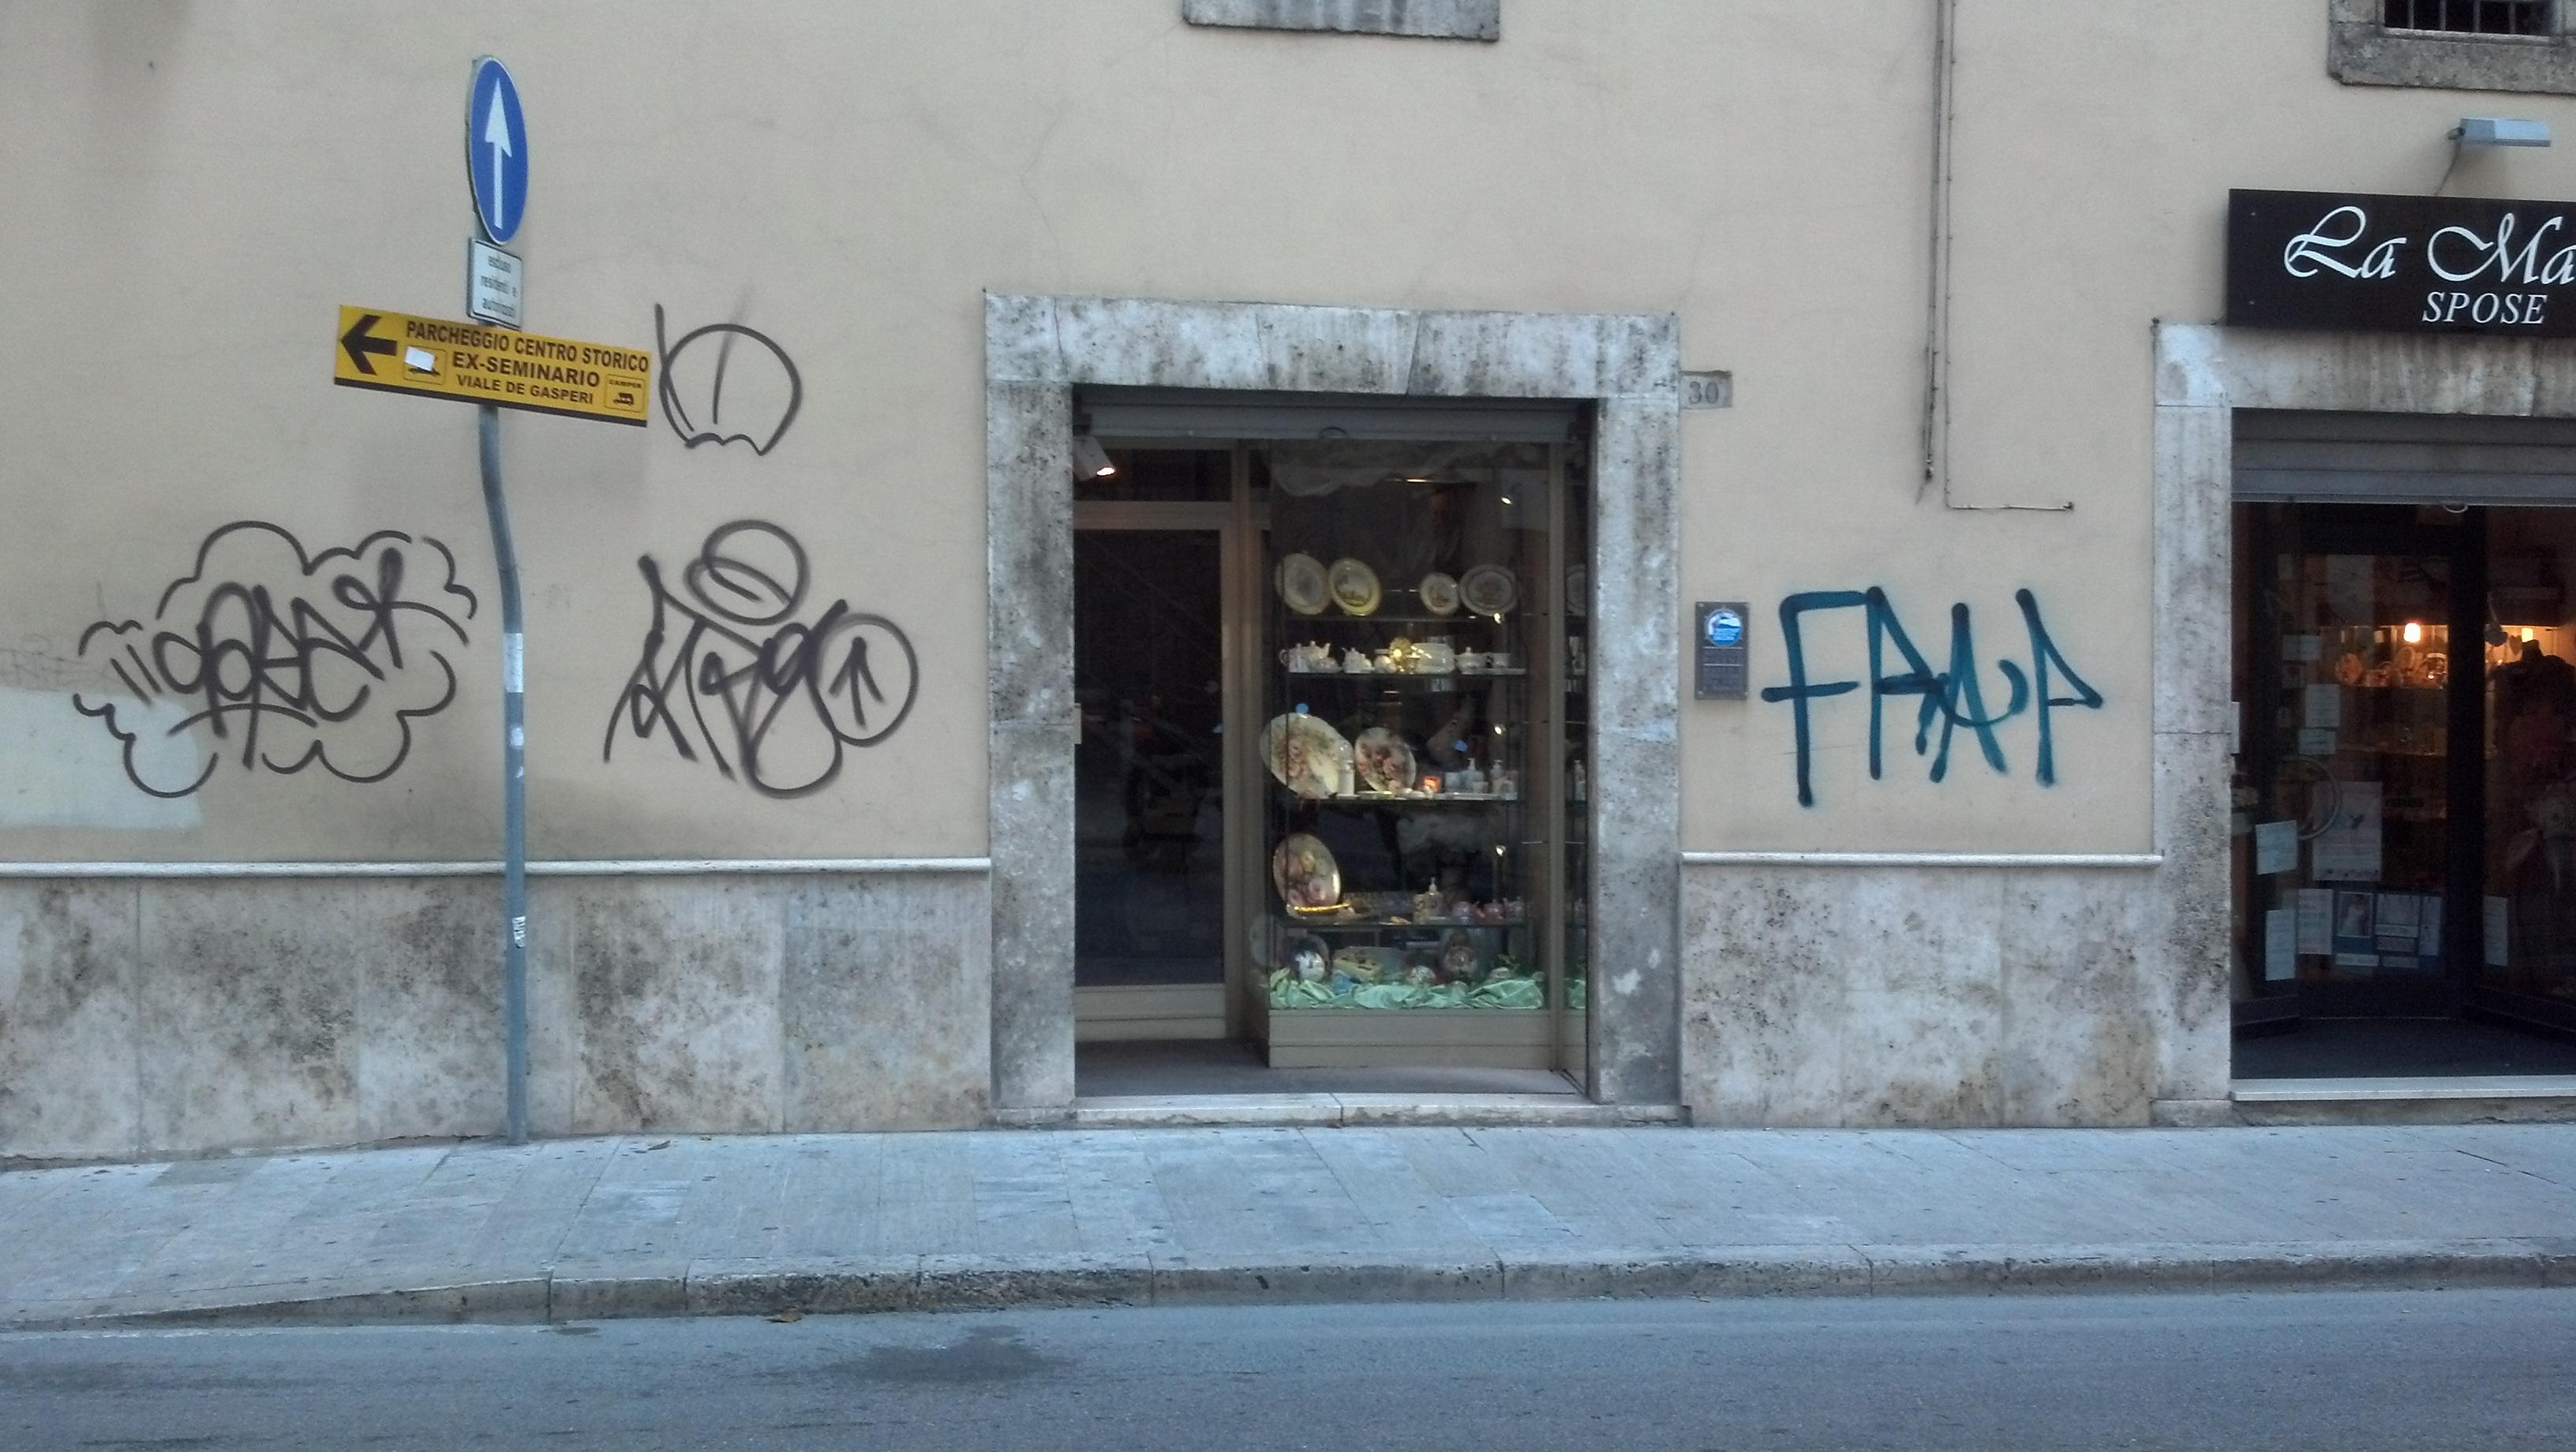 Graffiti ad Ascoli, ottobre 2012 20